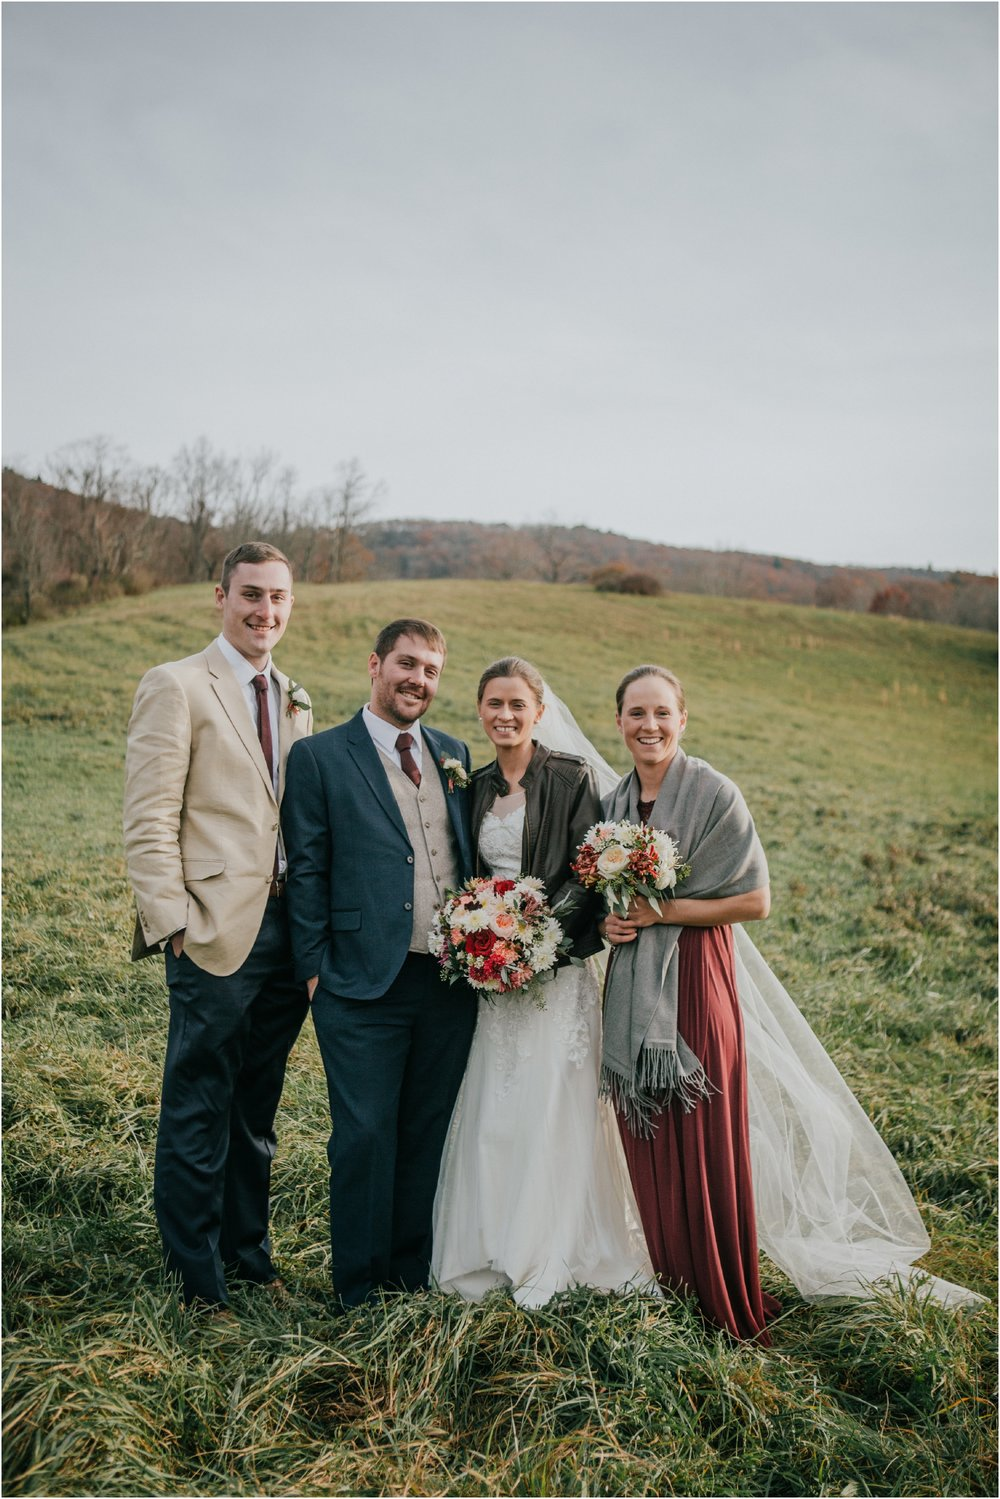 warm-springs-old-dairy-virginia-rustic-wedding-northeast-tennessee-elopement-adventuruous-photographer-katy-sergent_0061.jpg